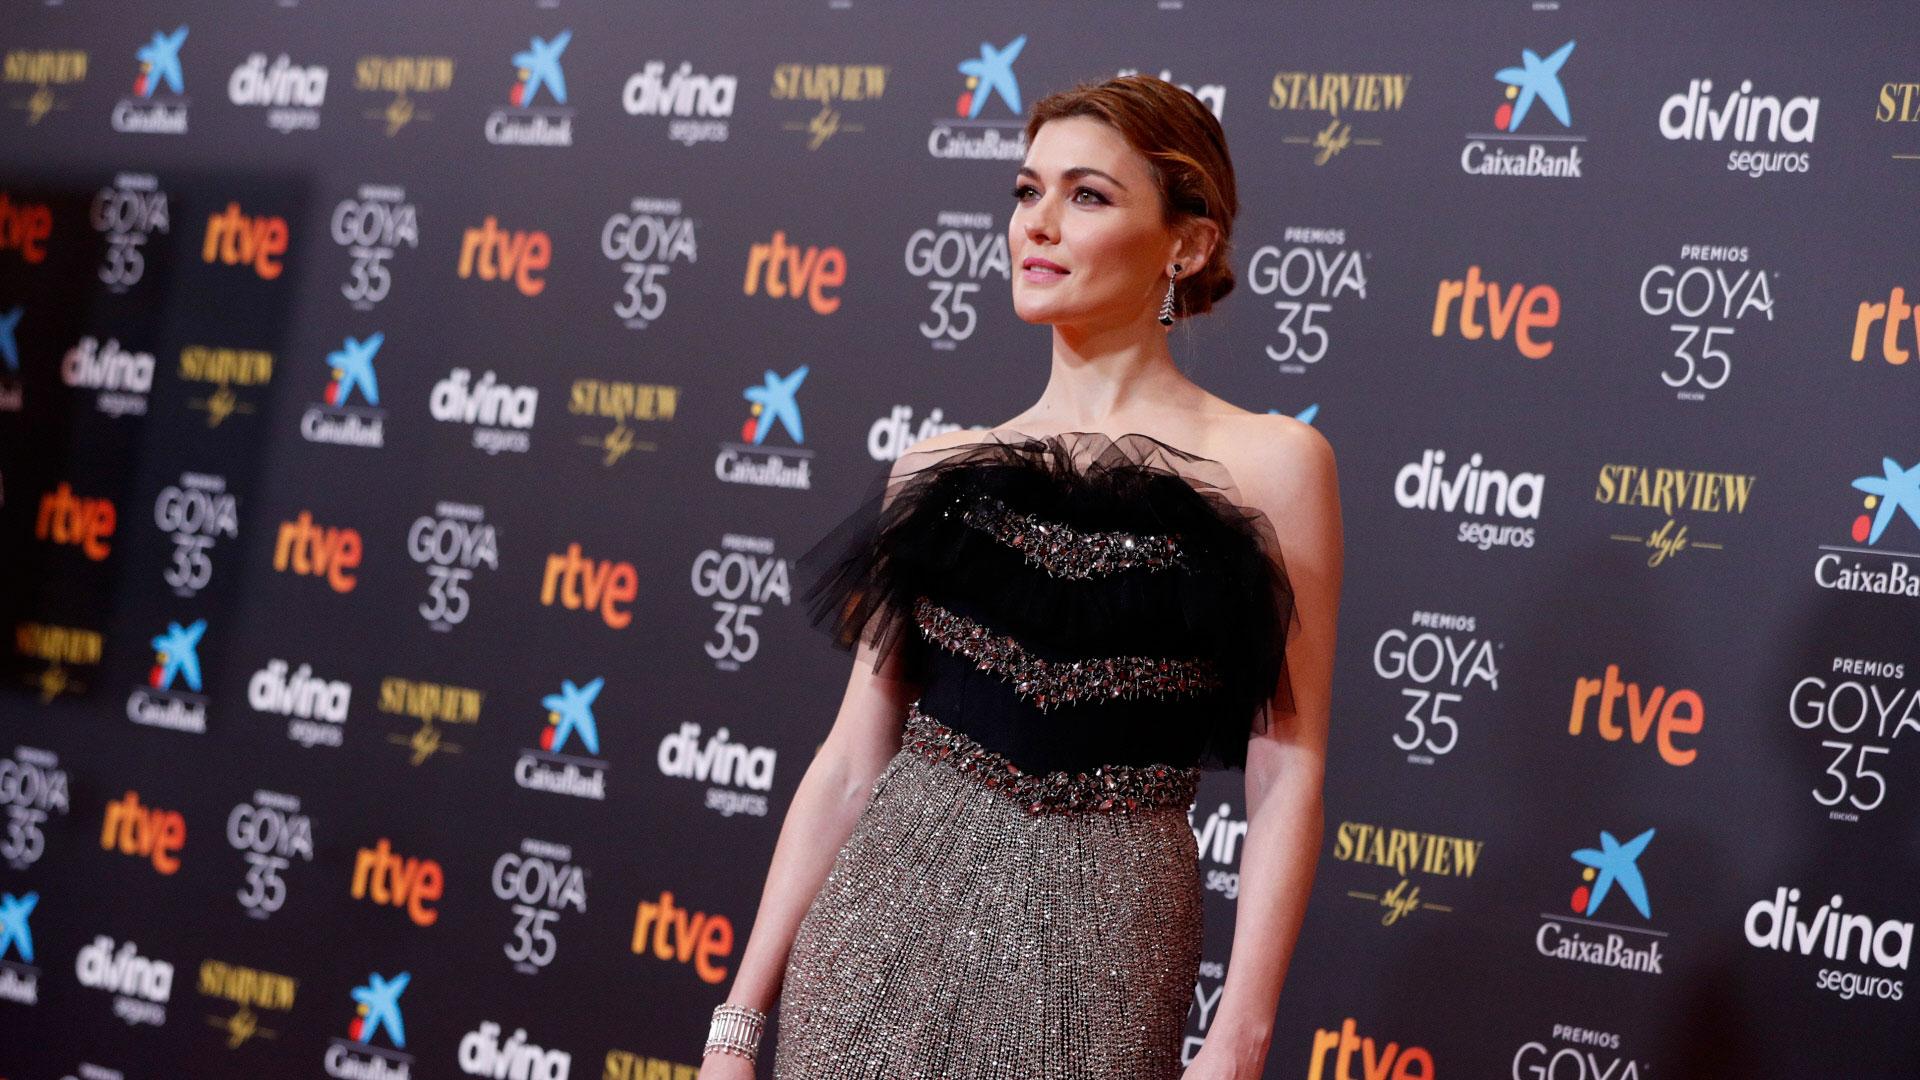 Marta Nieto Premios Goya